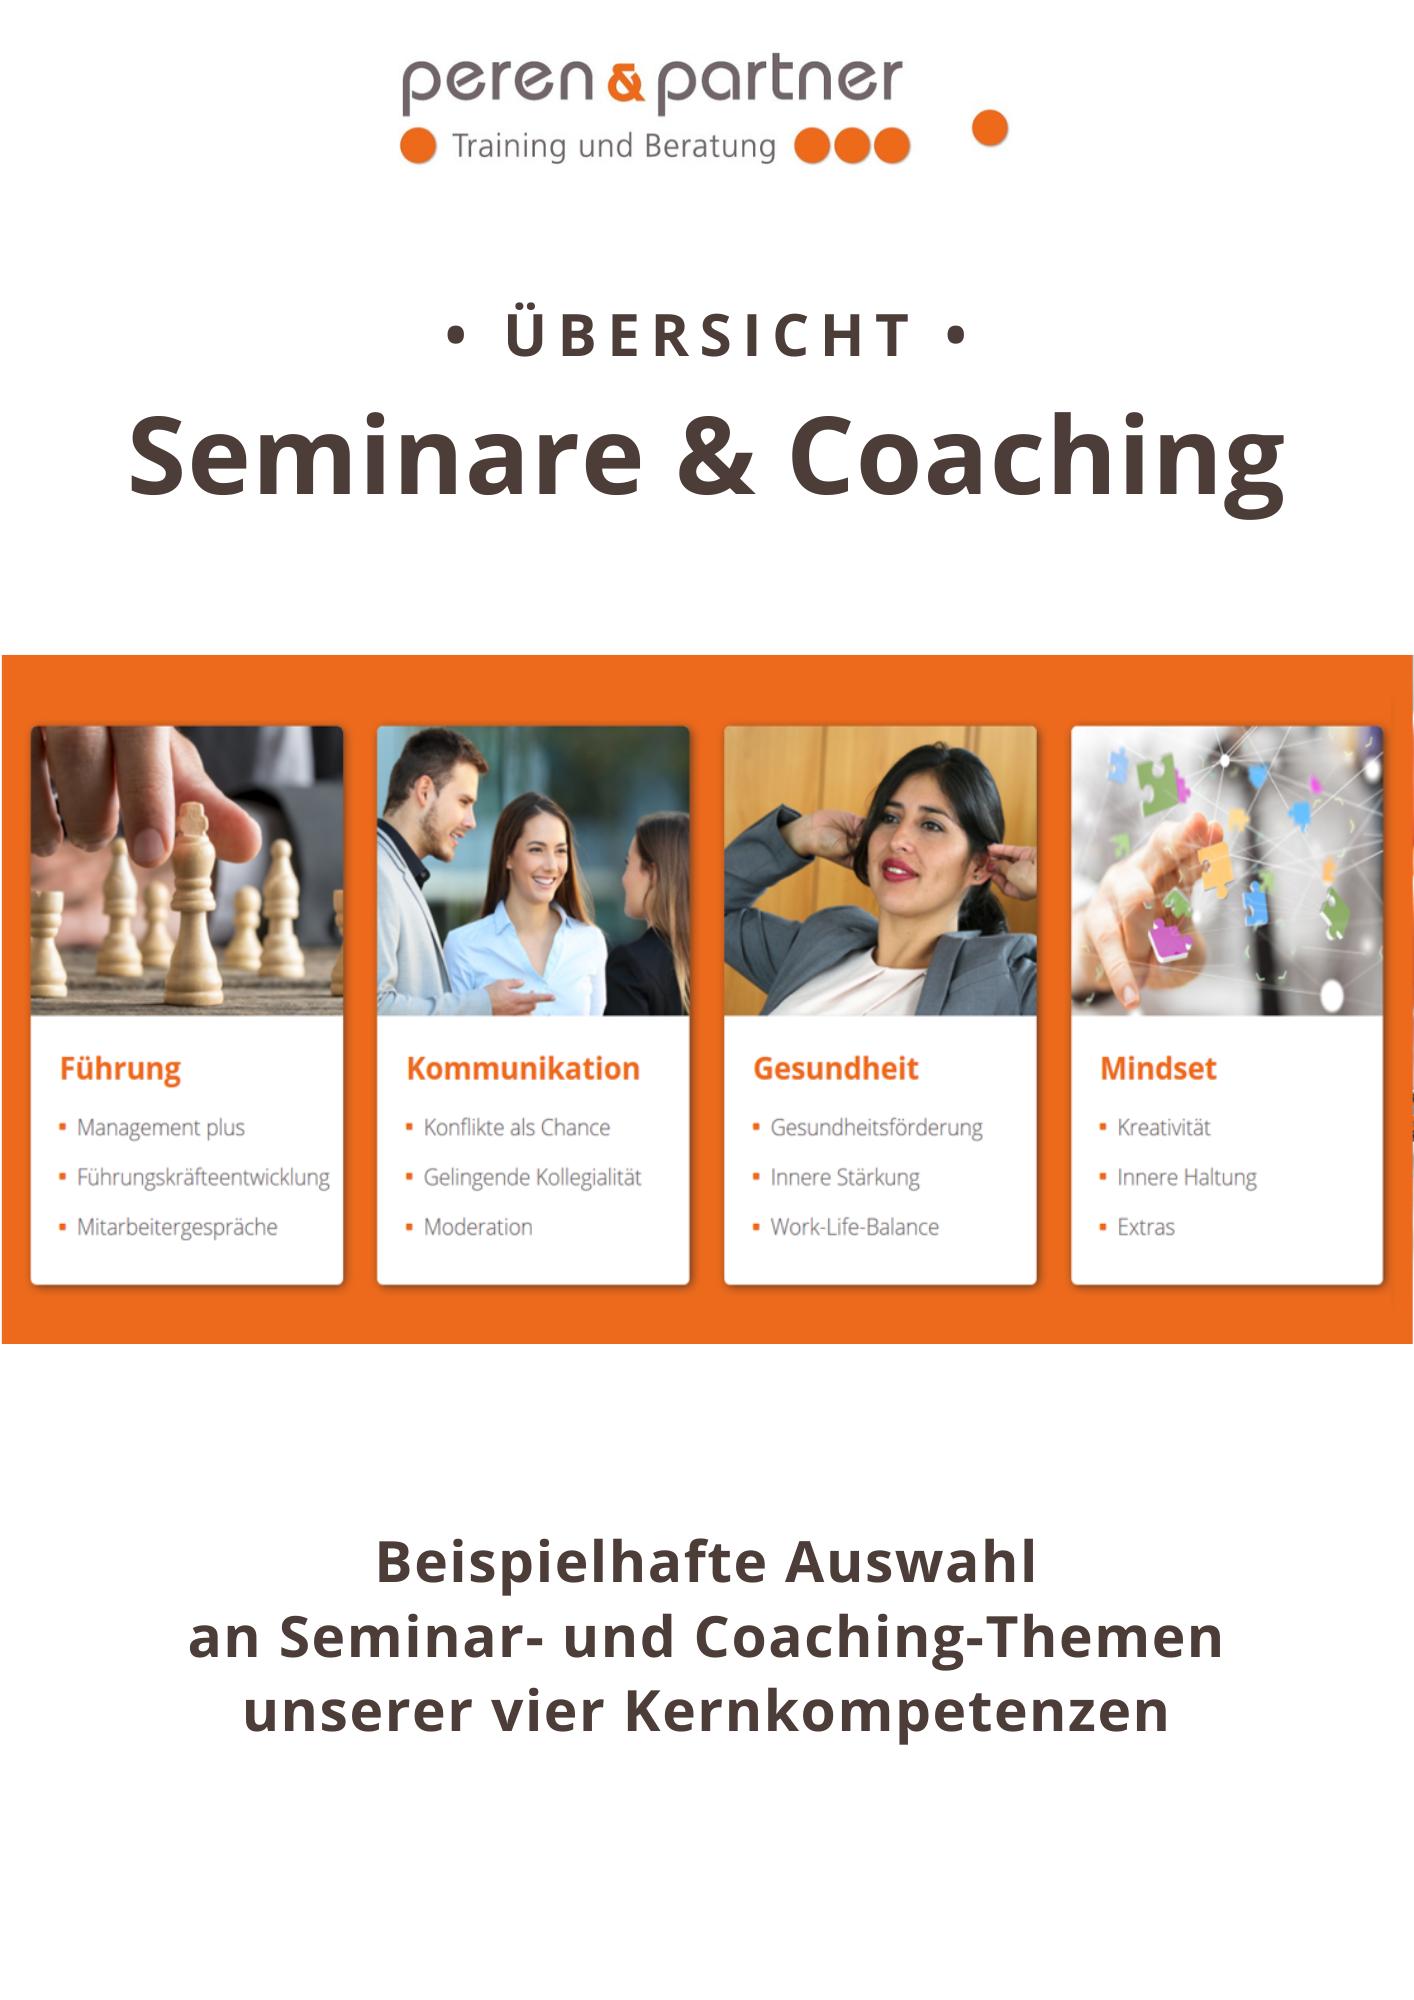 Inhouse Seminare